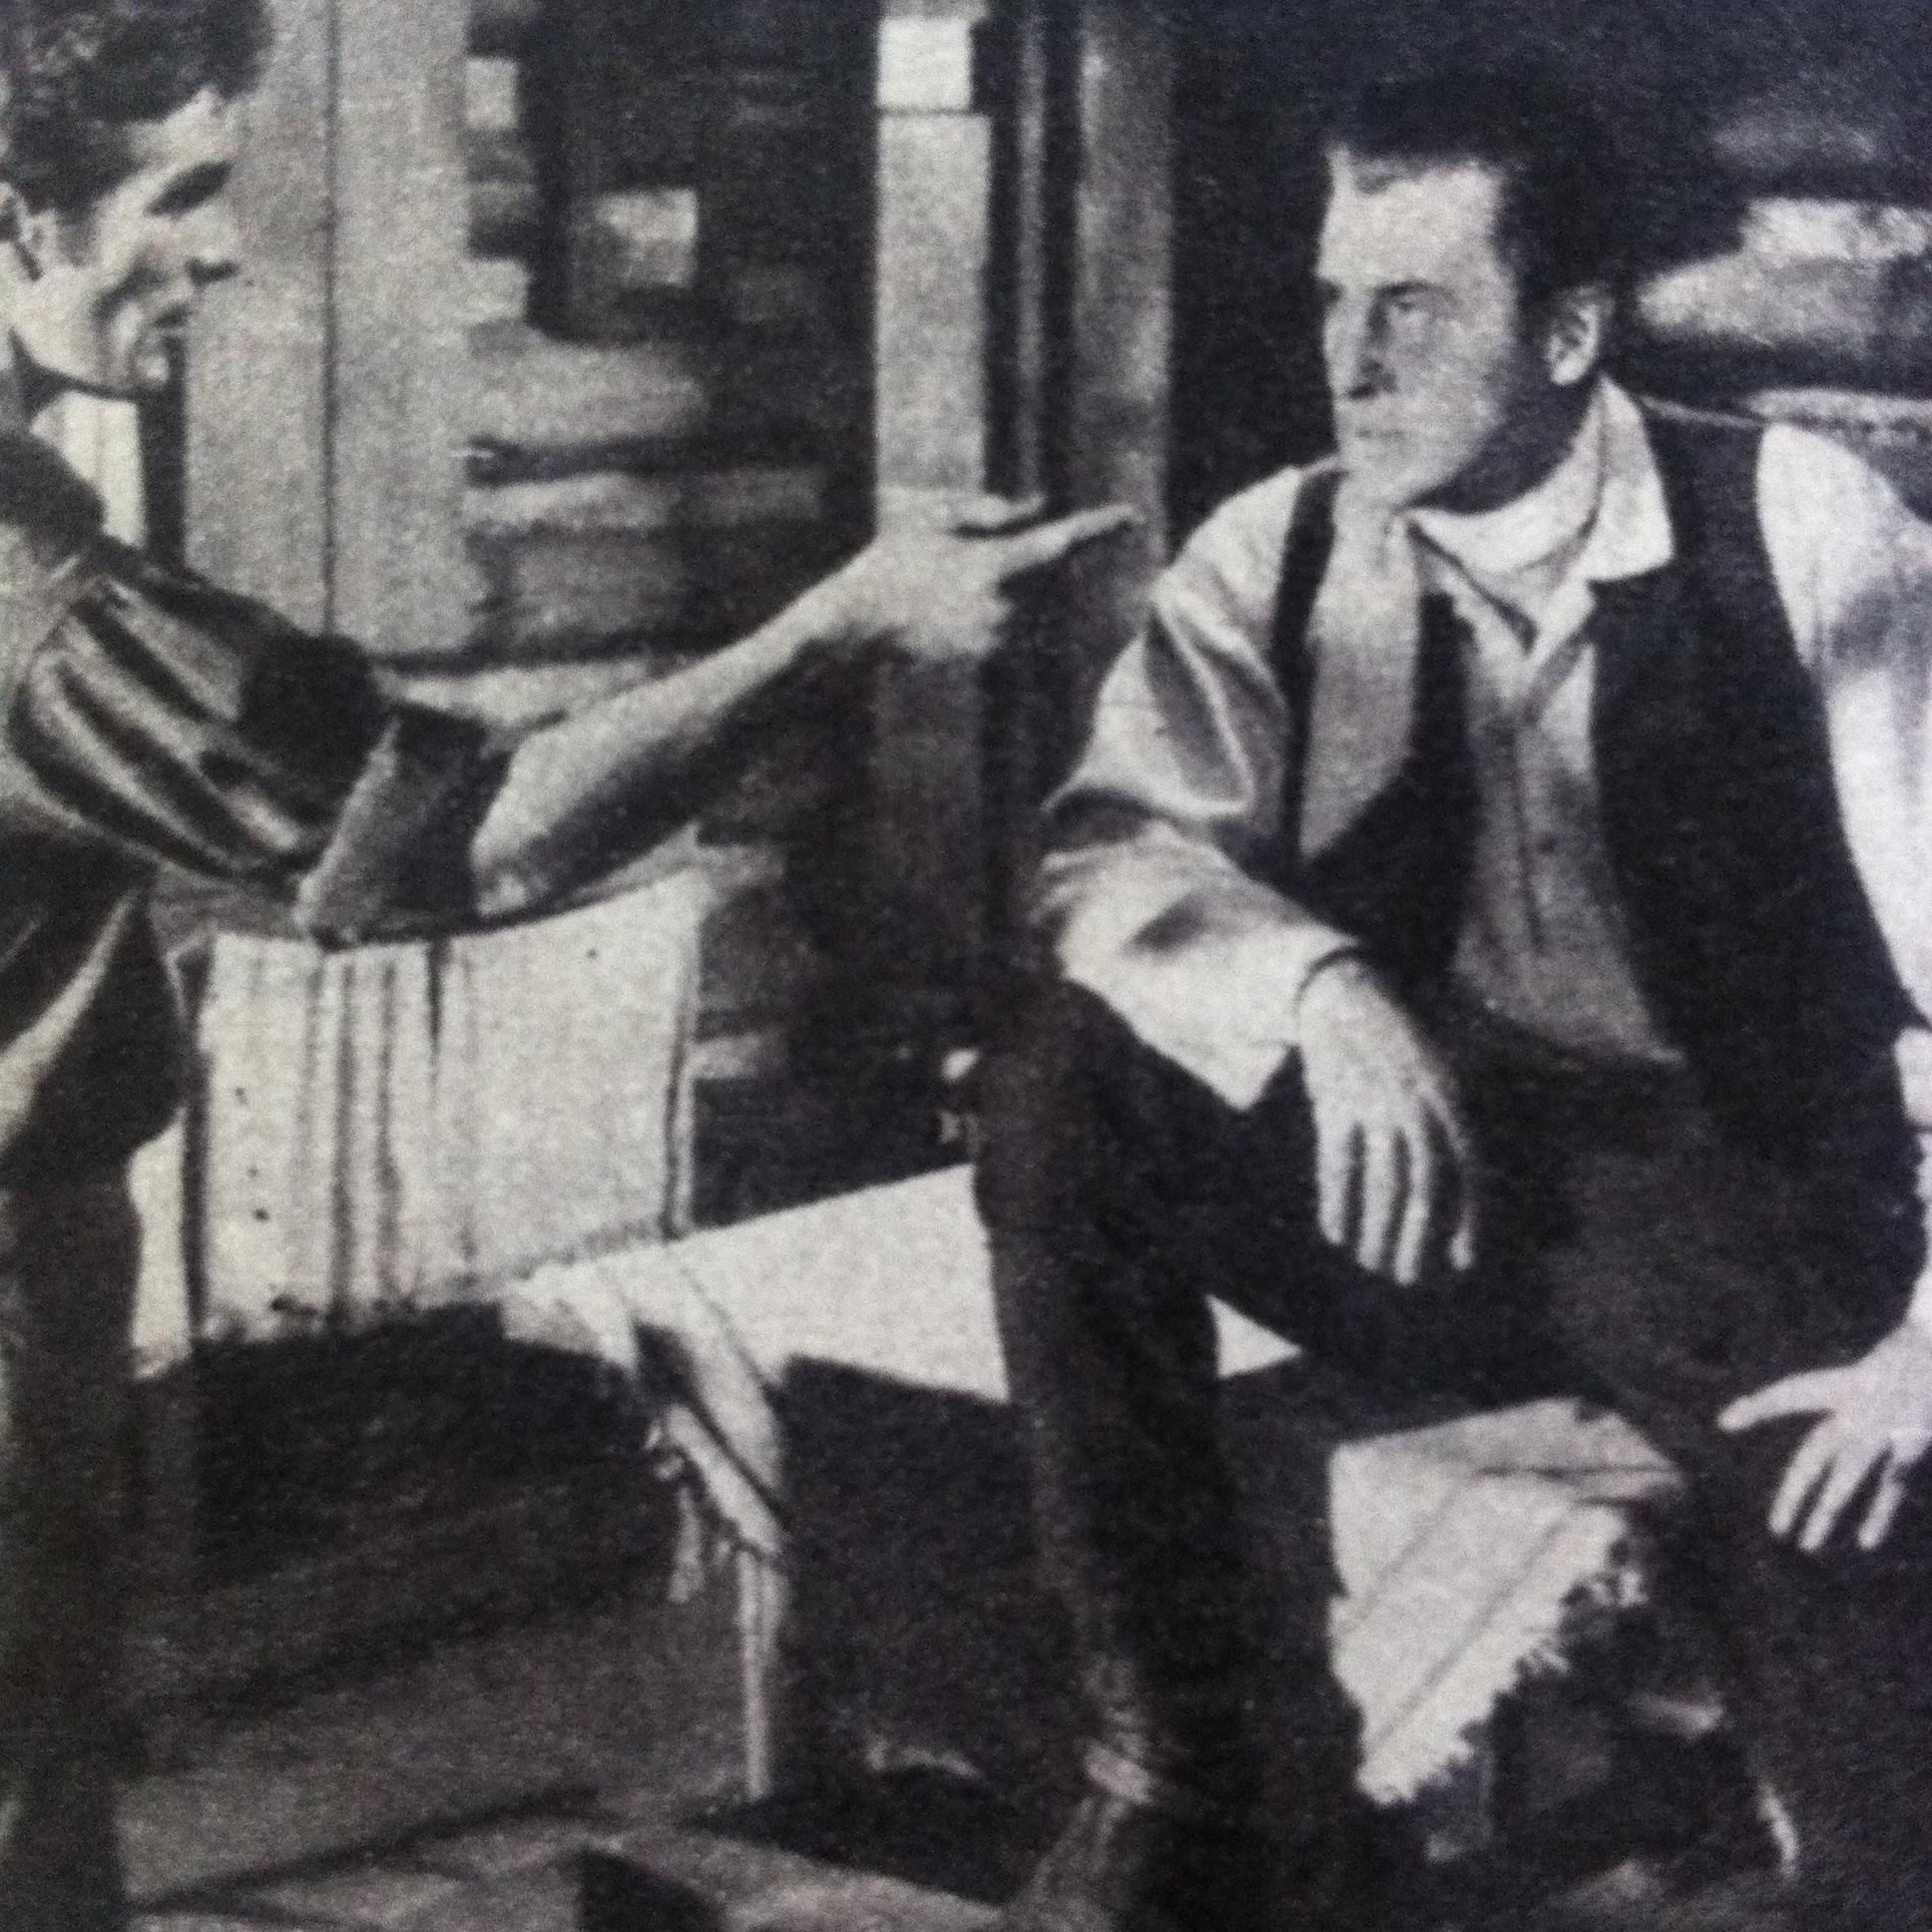 Stewart Granger and Steve Rowland in Gun Glory (1957)